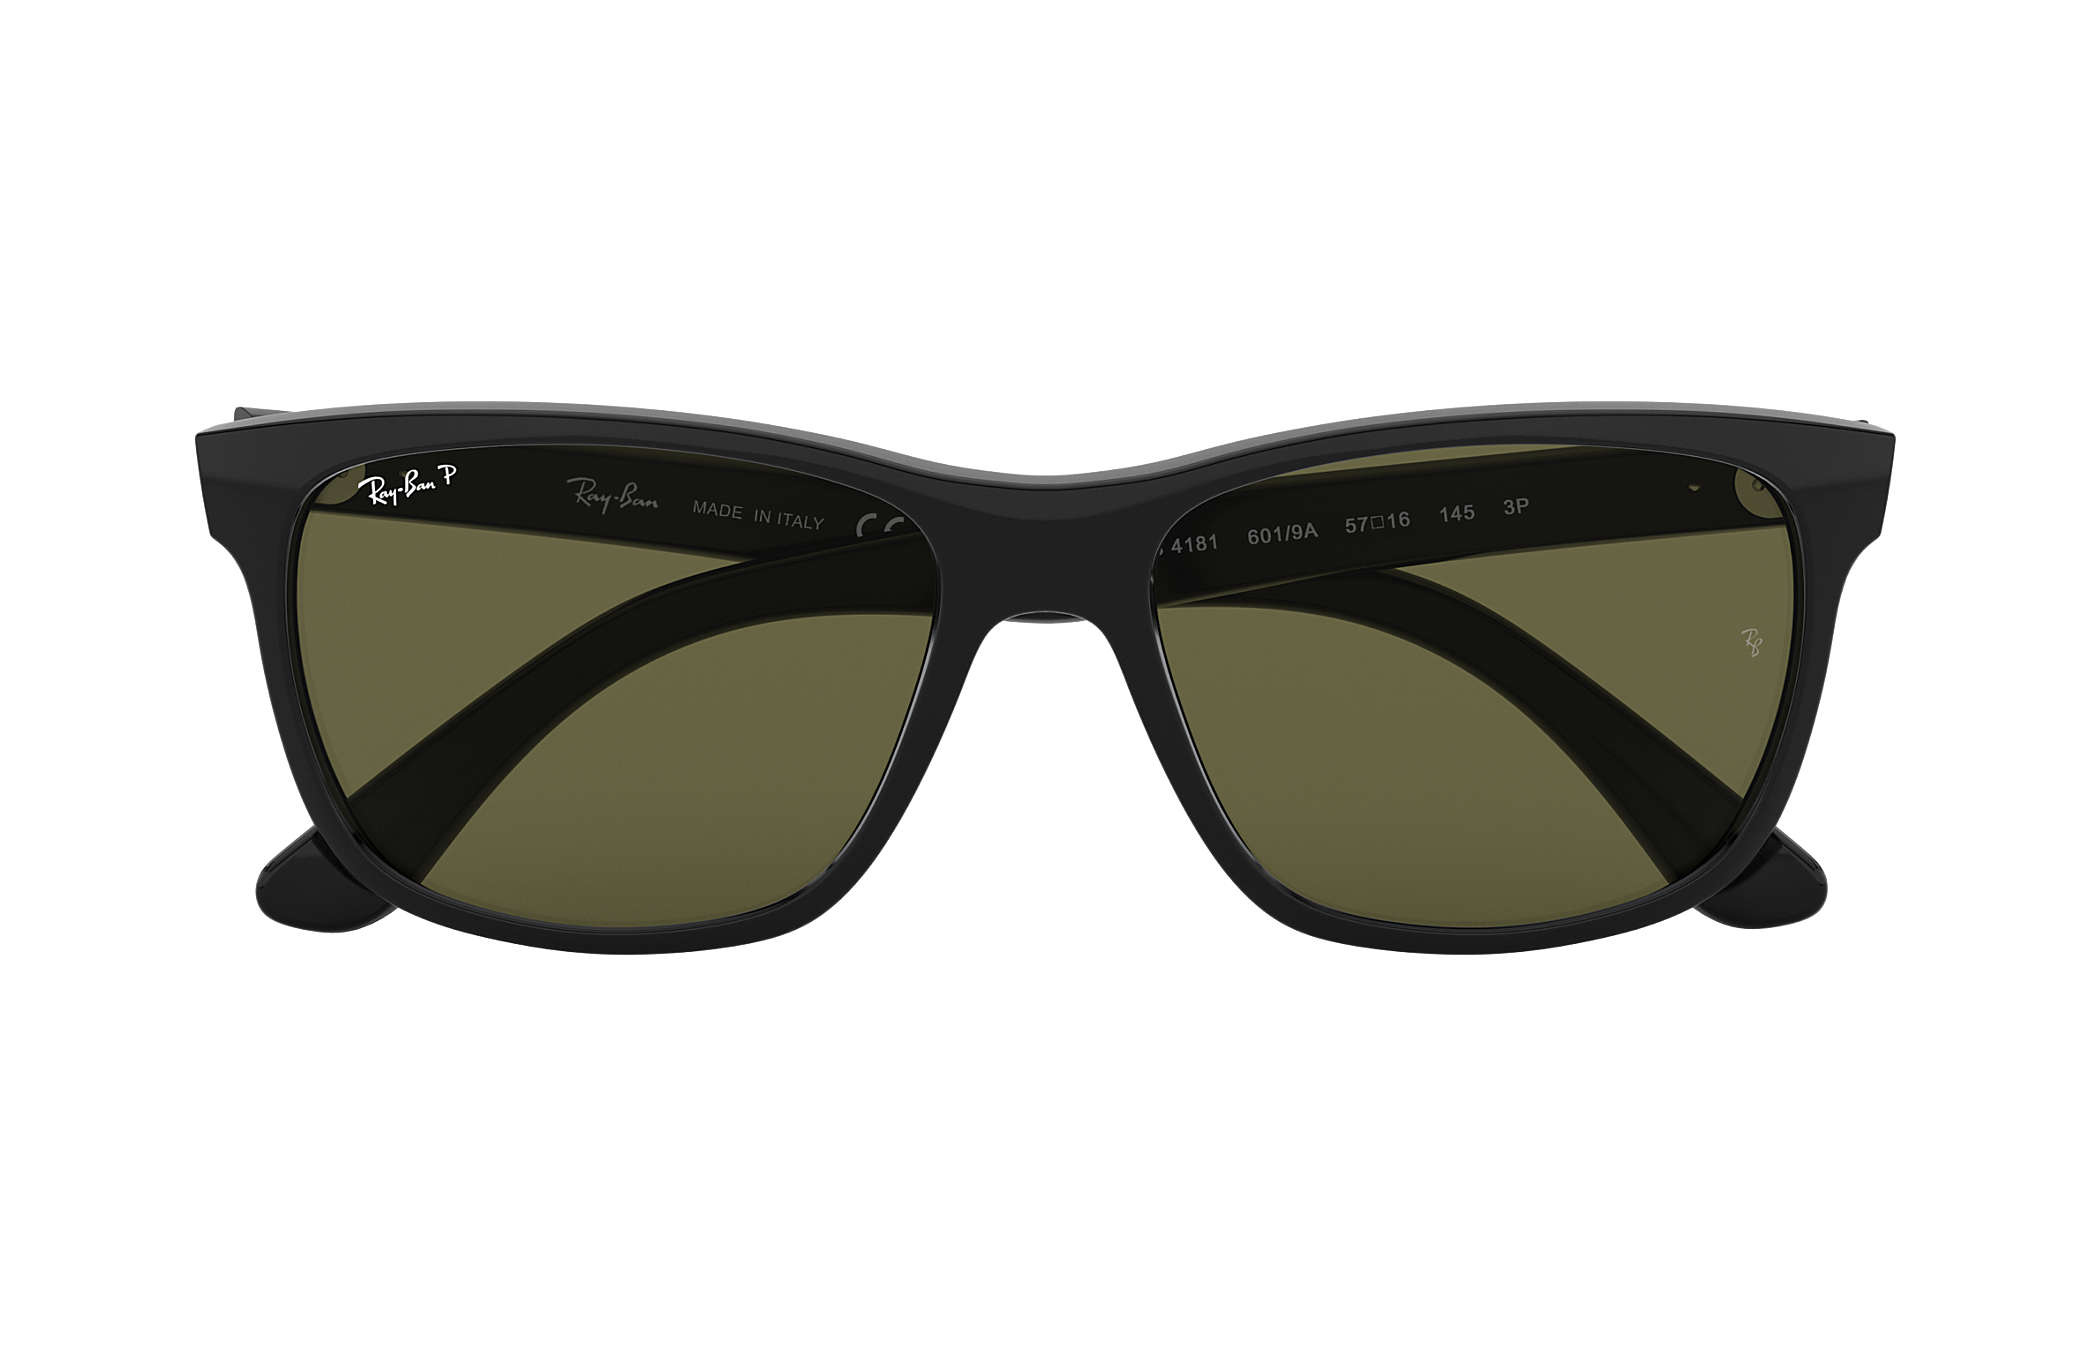 96c40c7f6d Ray-Ban RB4181 Black - Nylon - Green Polarized Lenses - 0RB4181601 ...